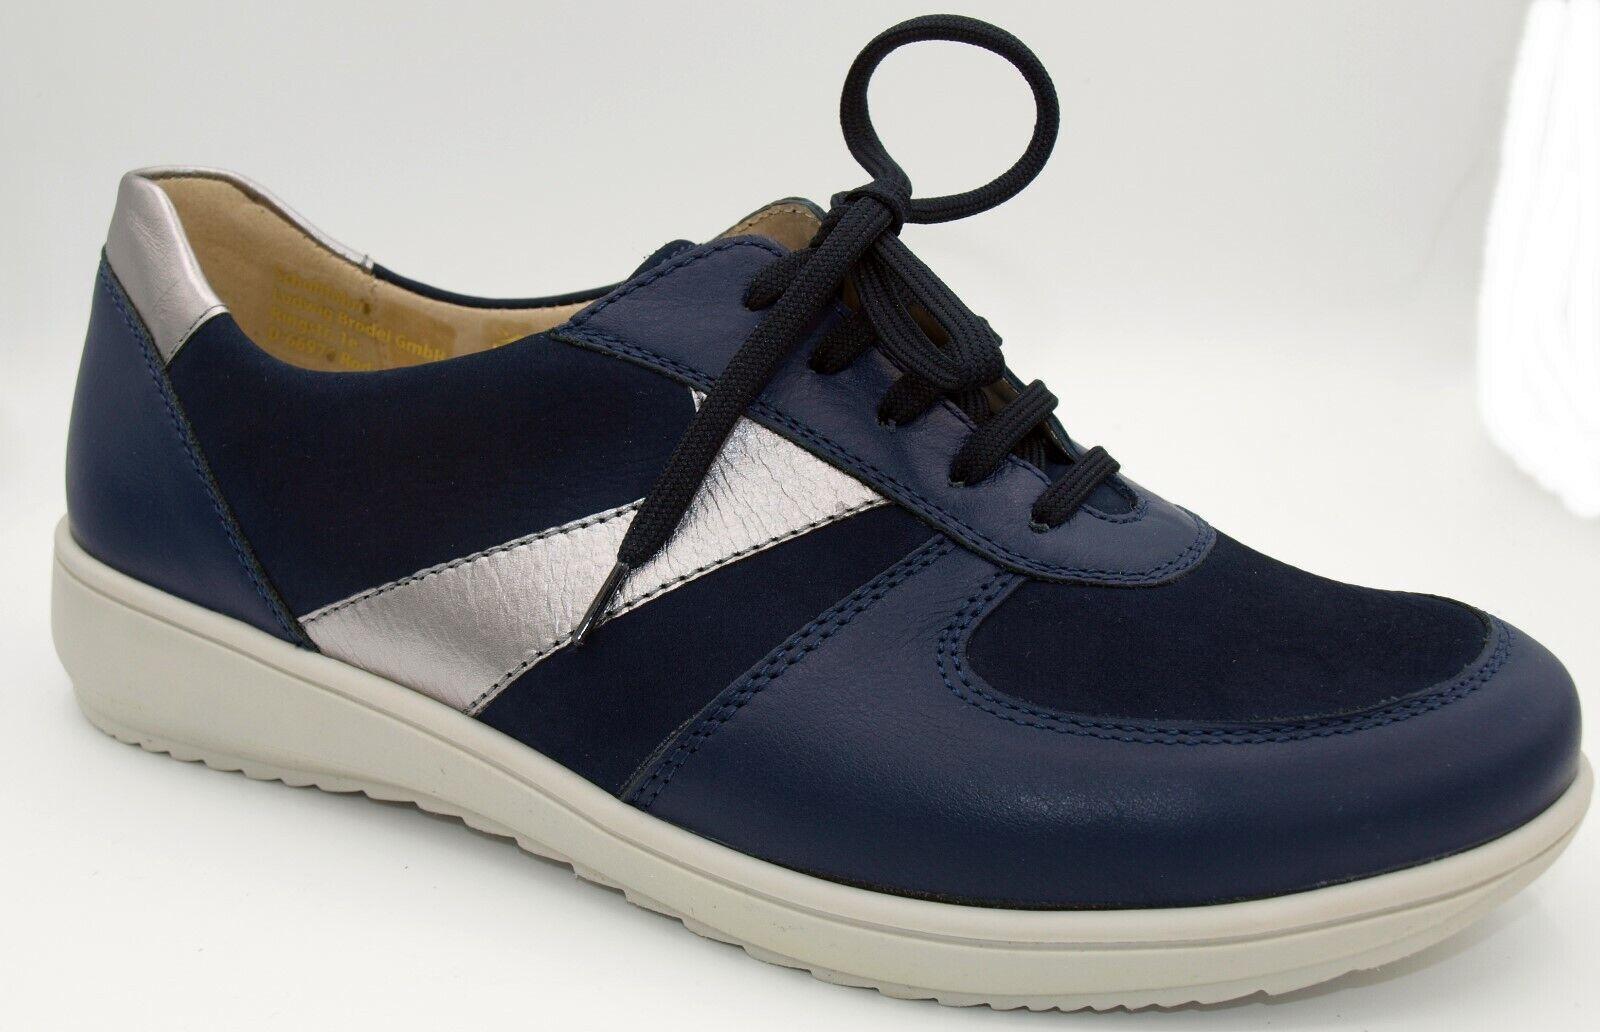 Schuhe Damen Goldkrone Schnürschuhe Echt Leder dunkelblau Weite H Neu 590/6